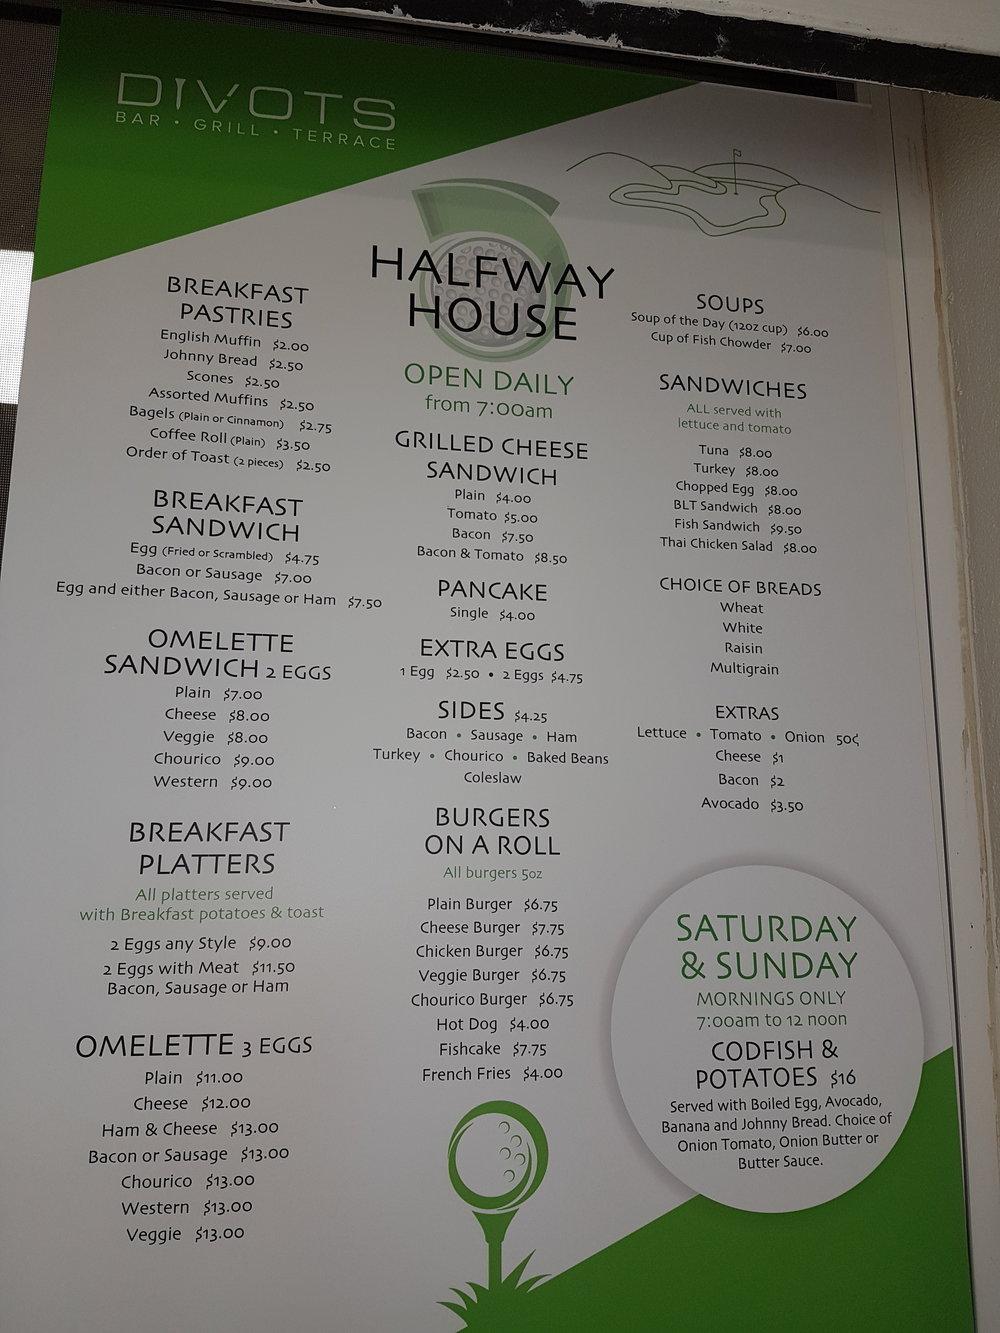 Half way house.jpg